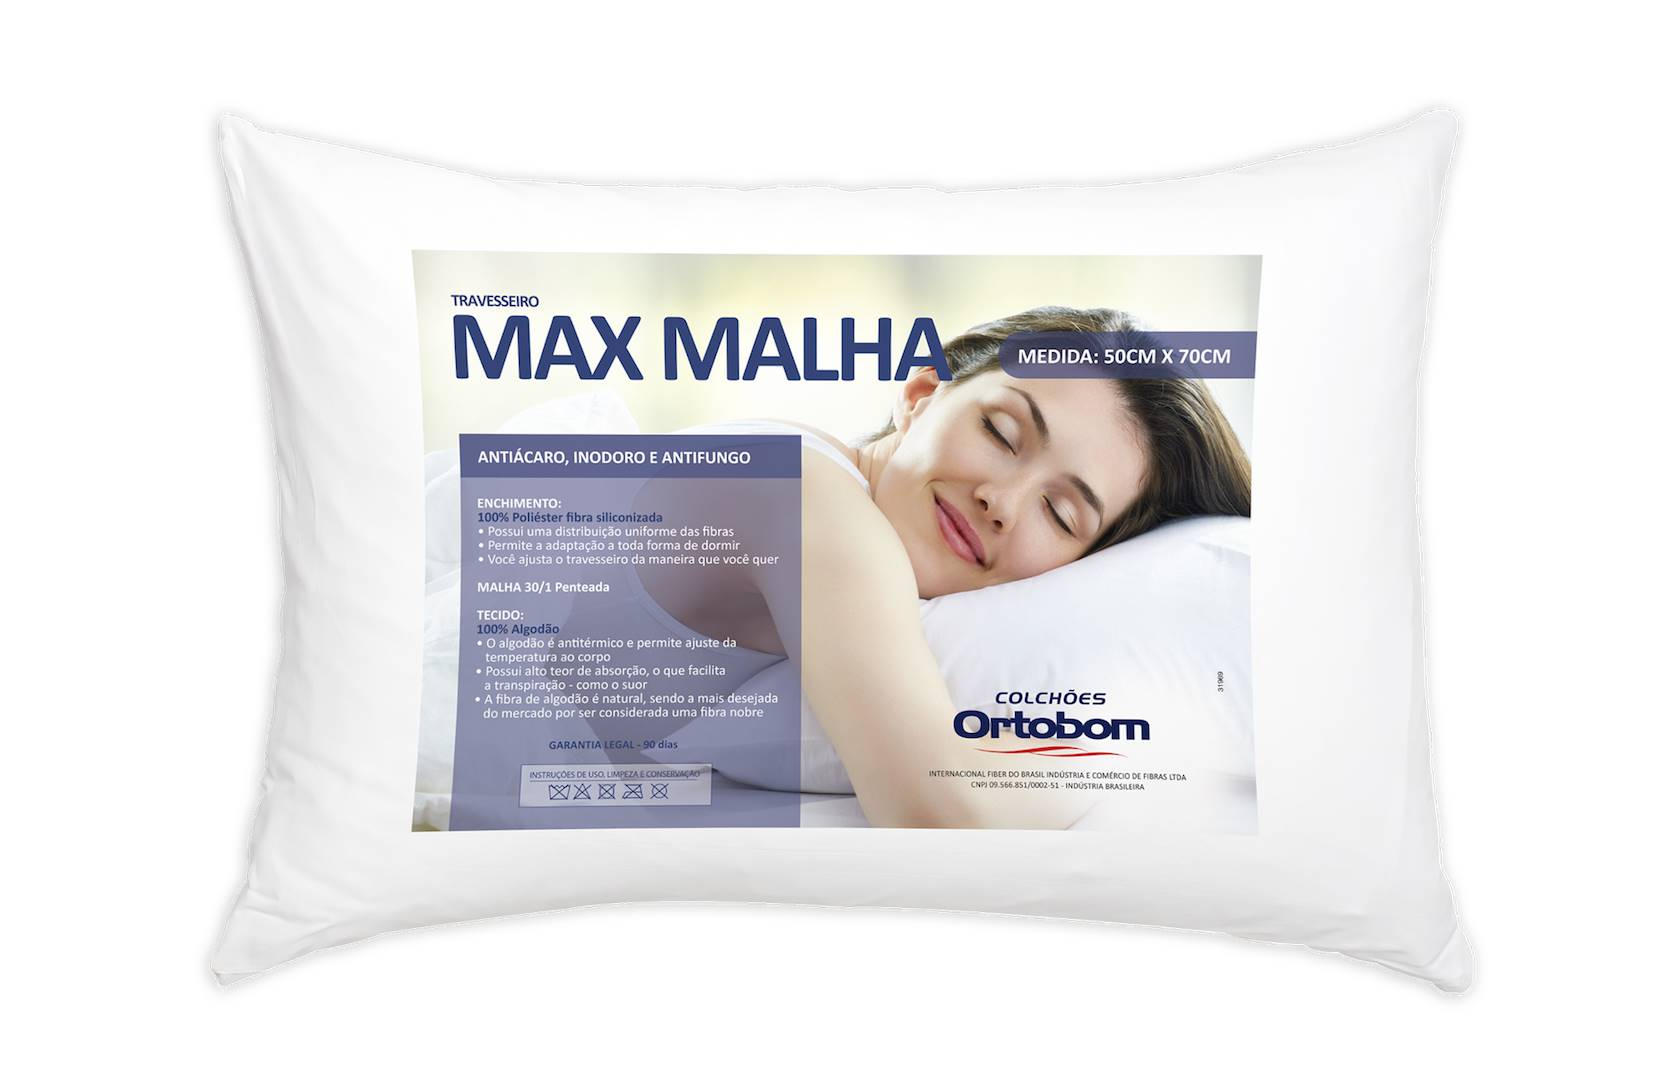 Travesseiro Max Malha cor Branco - 43605